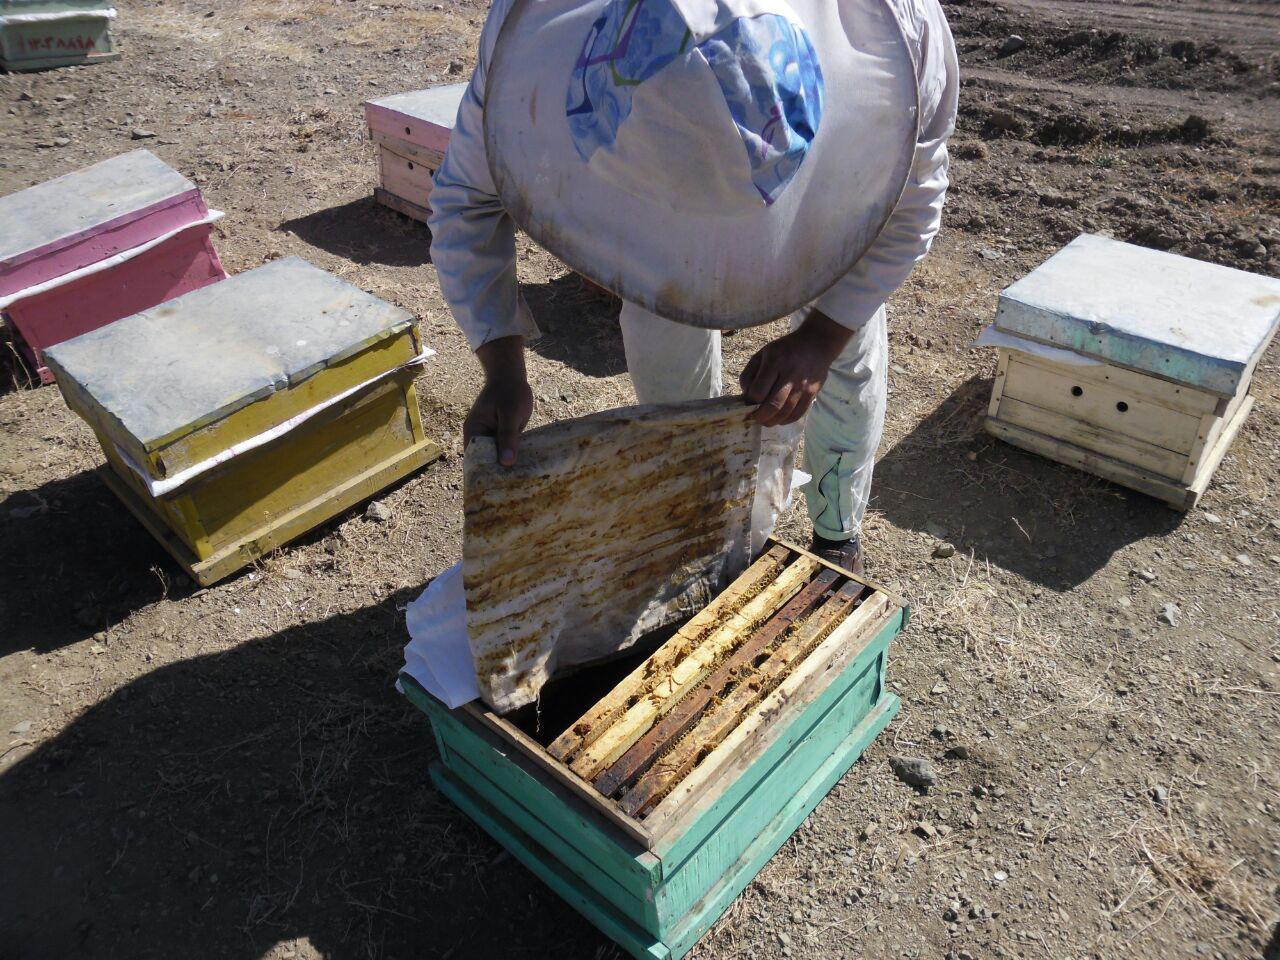 شهد شيرين كارآفريني با پرورش زنبور عسل در كردستان